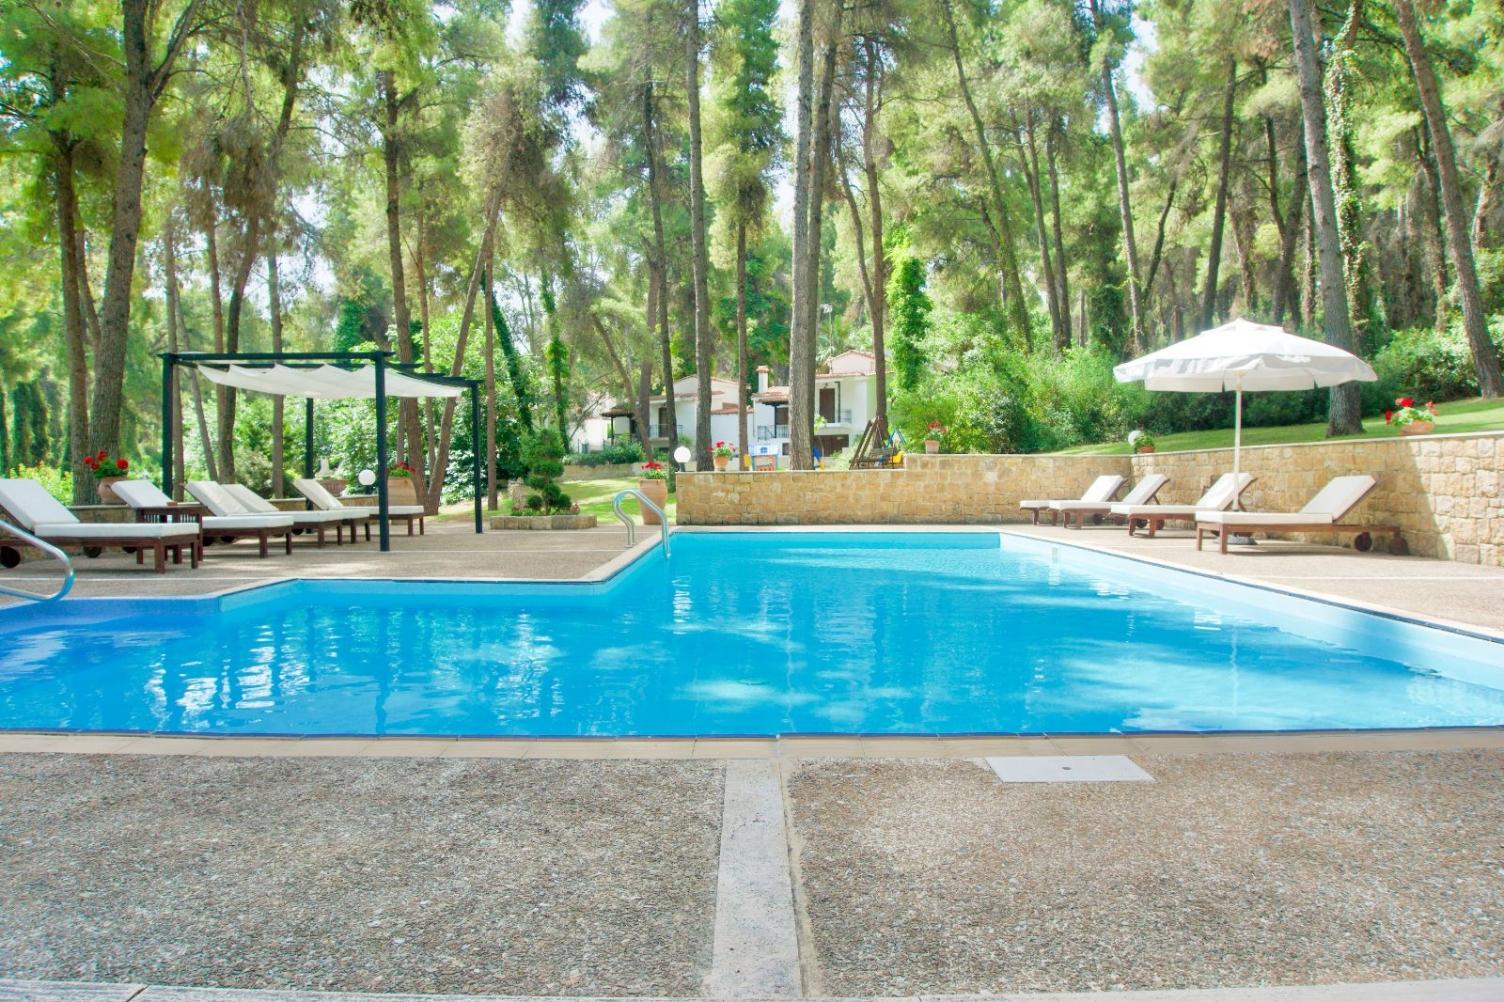 Swimming pool communal space